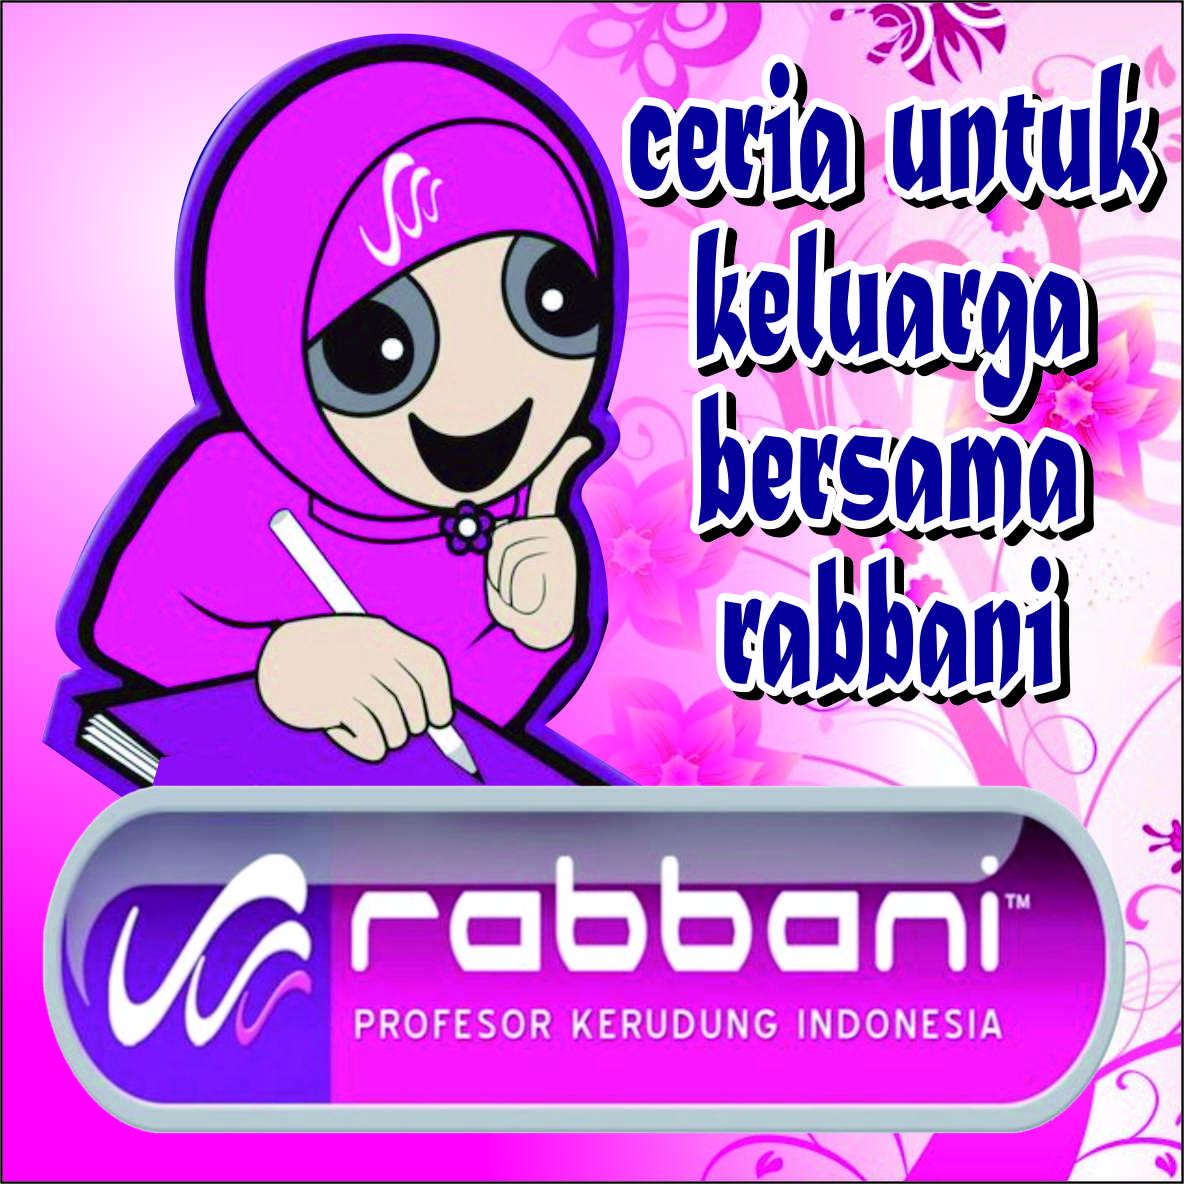 Spanduk Rabbani Profesor Kerudung Indonesia d5a1a459a8